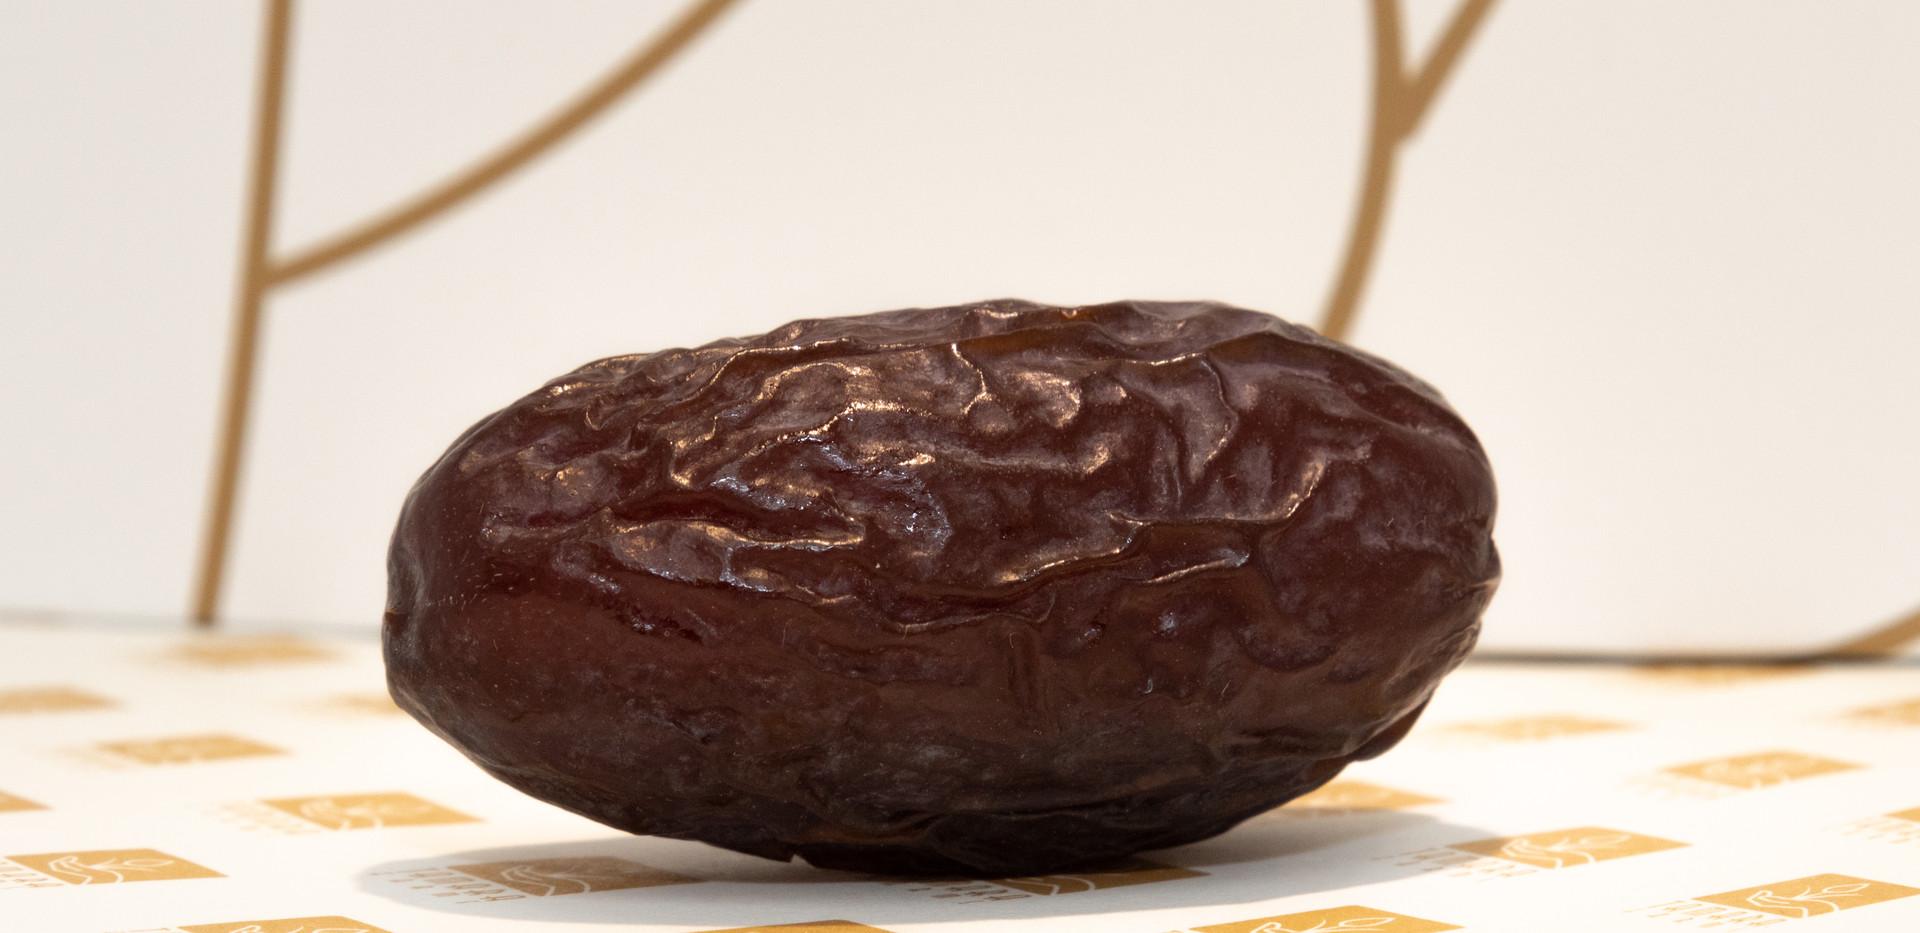 plain dates jumbo size